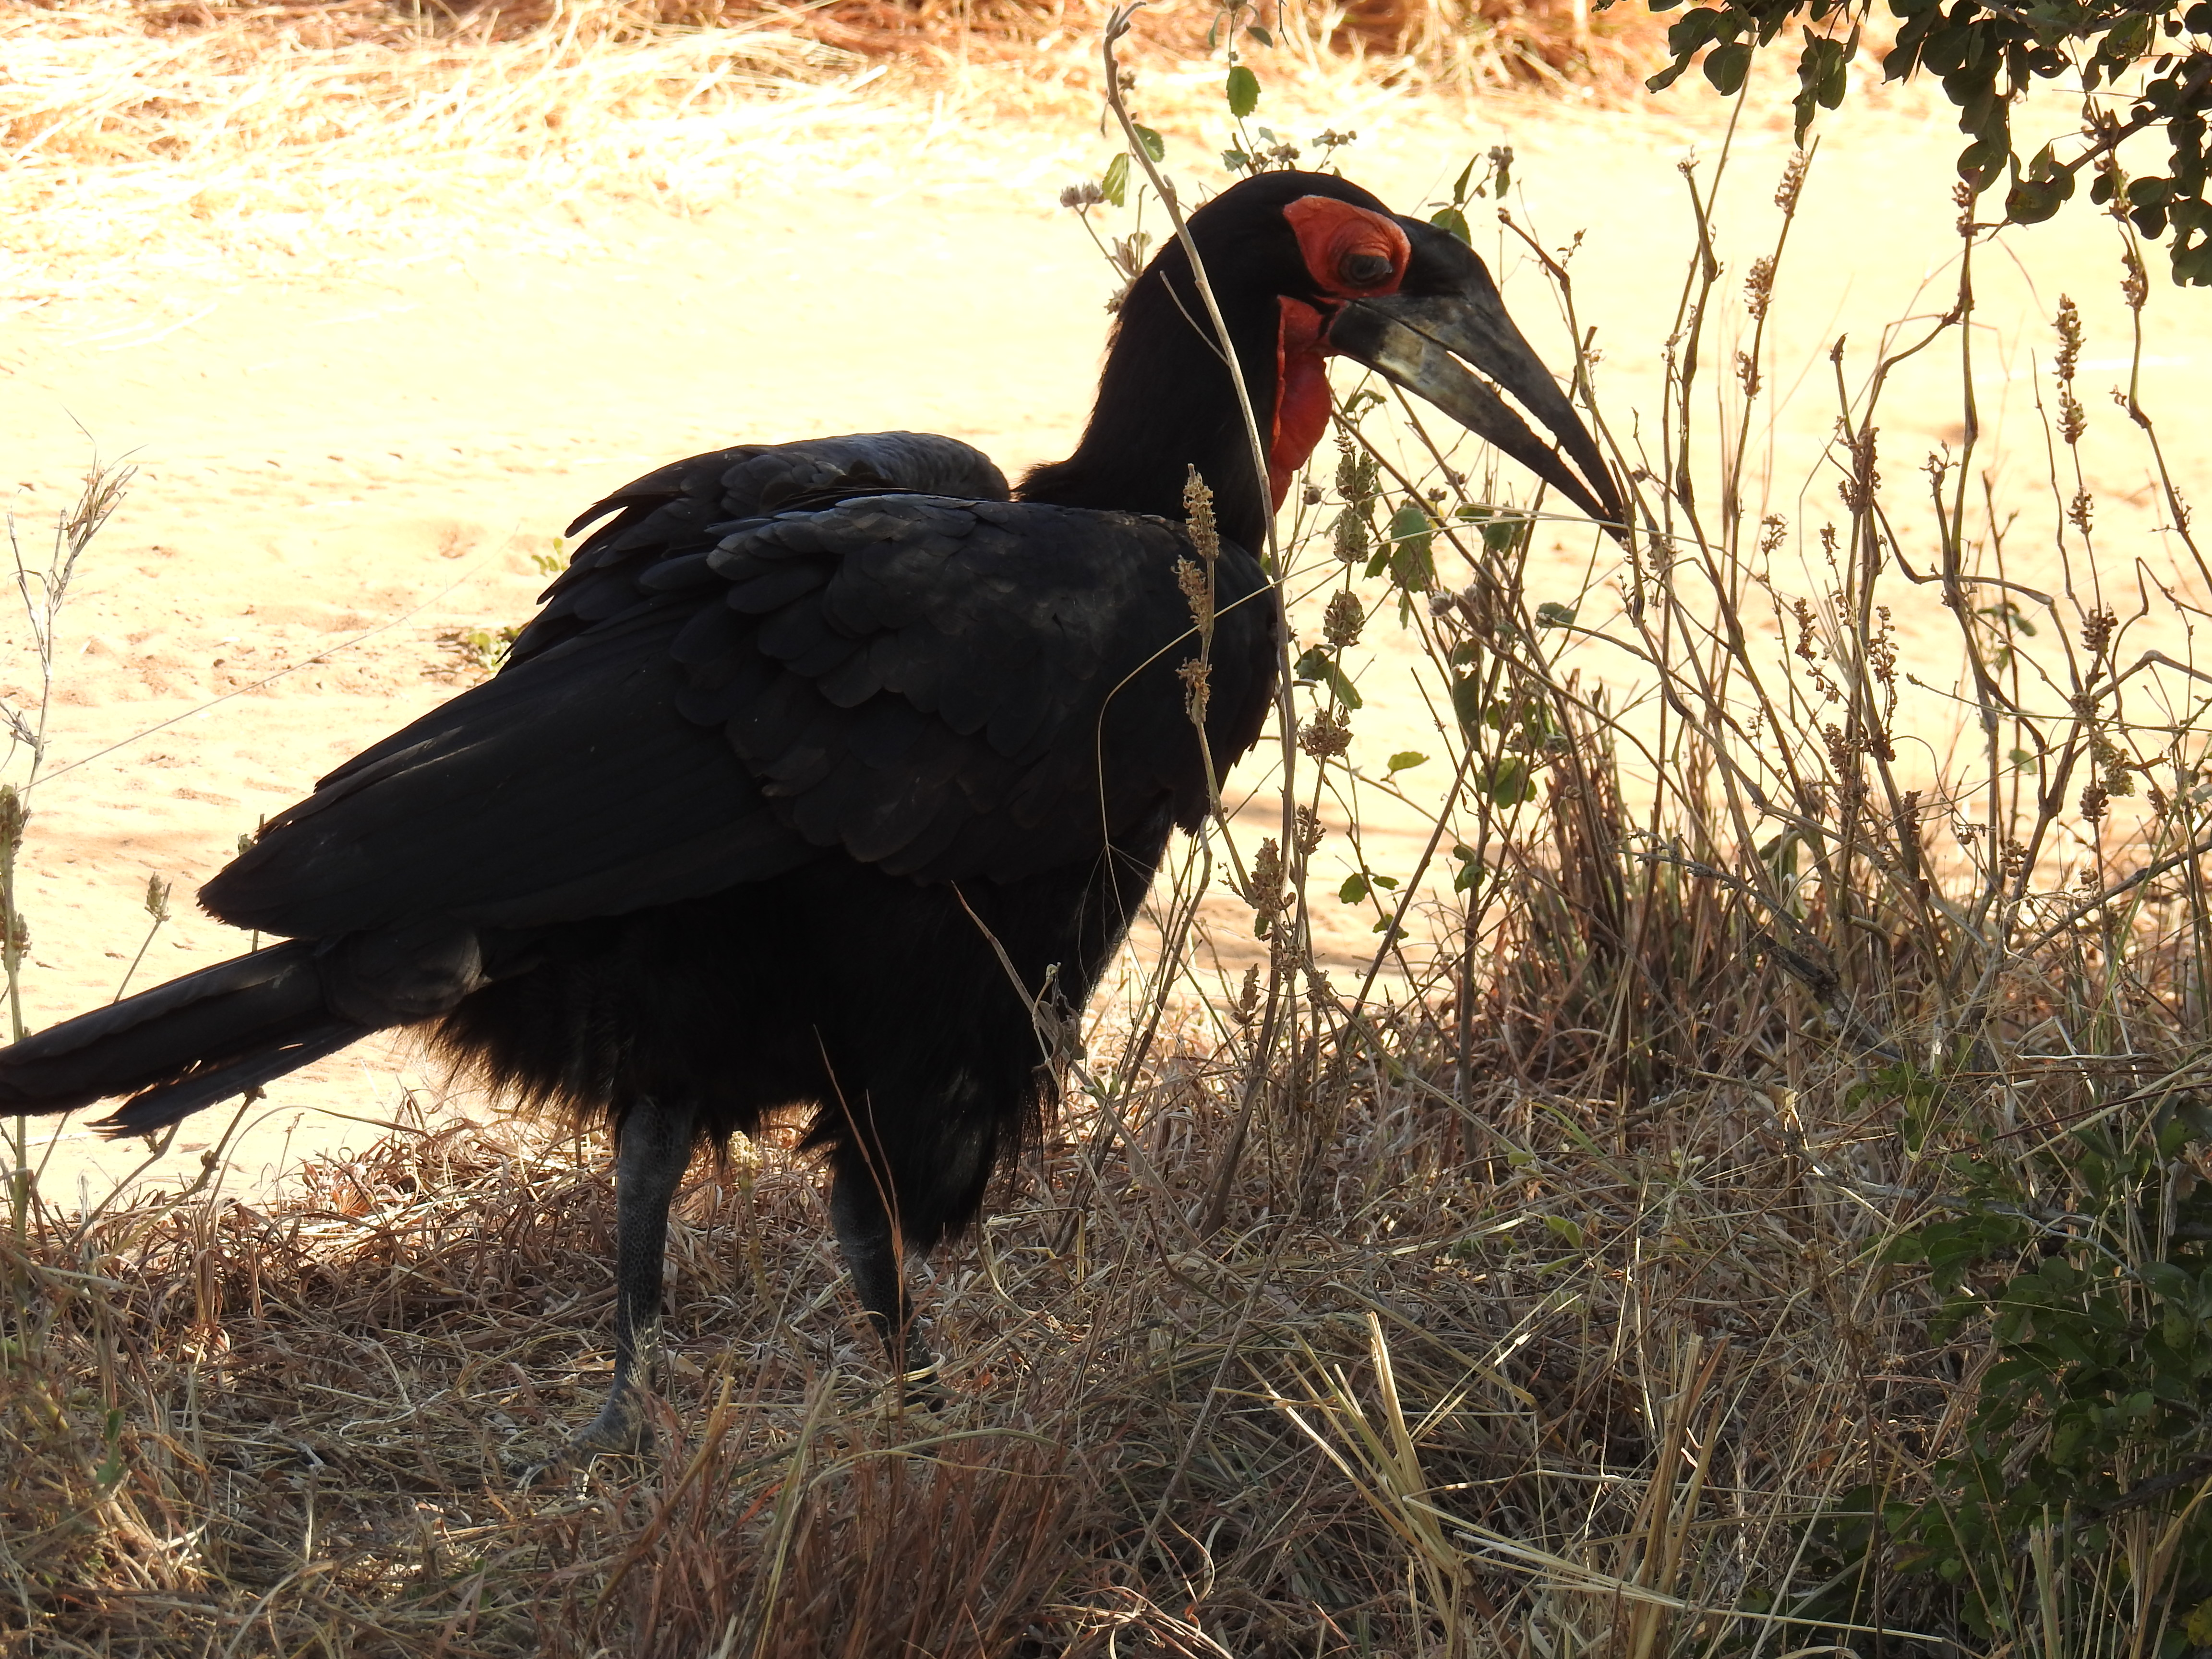 Red_and_black_bird.jpg